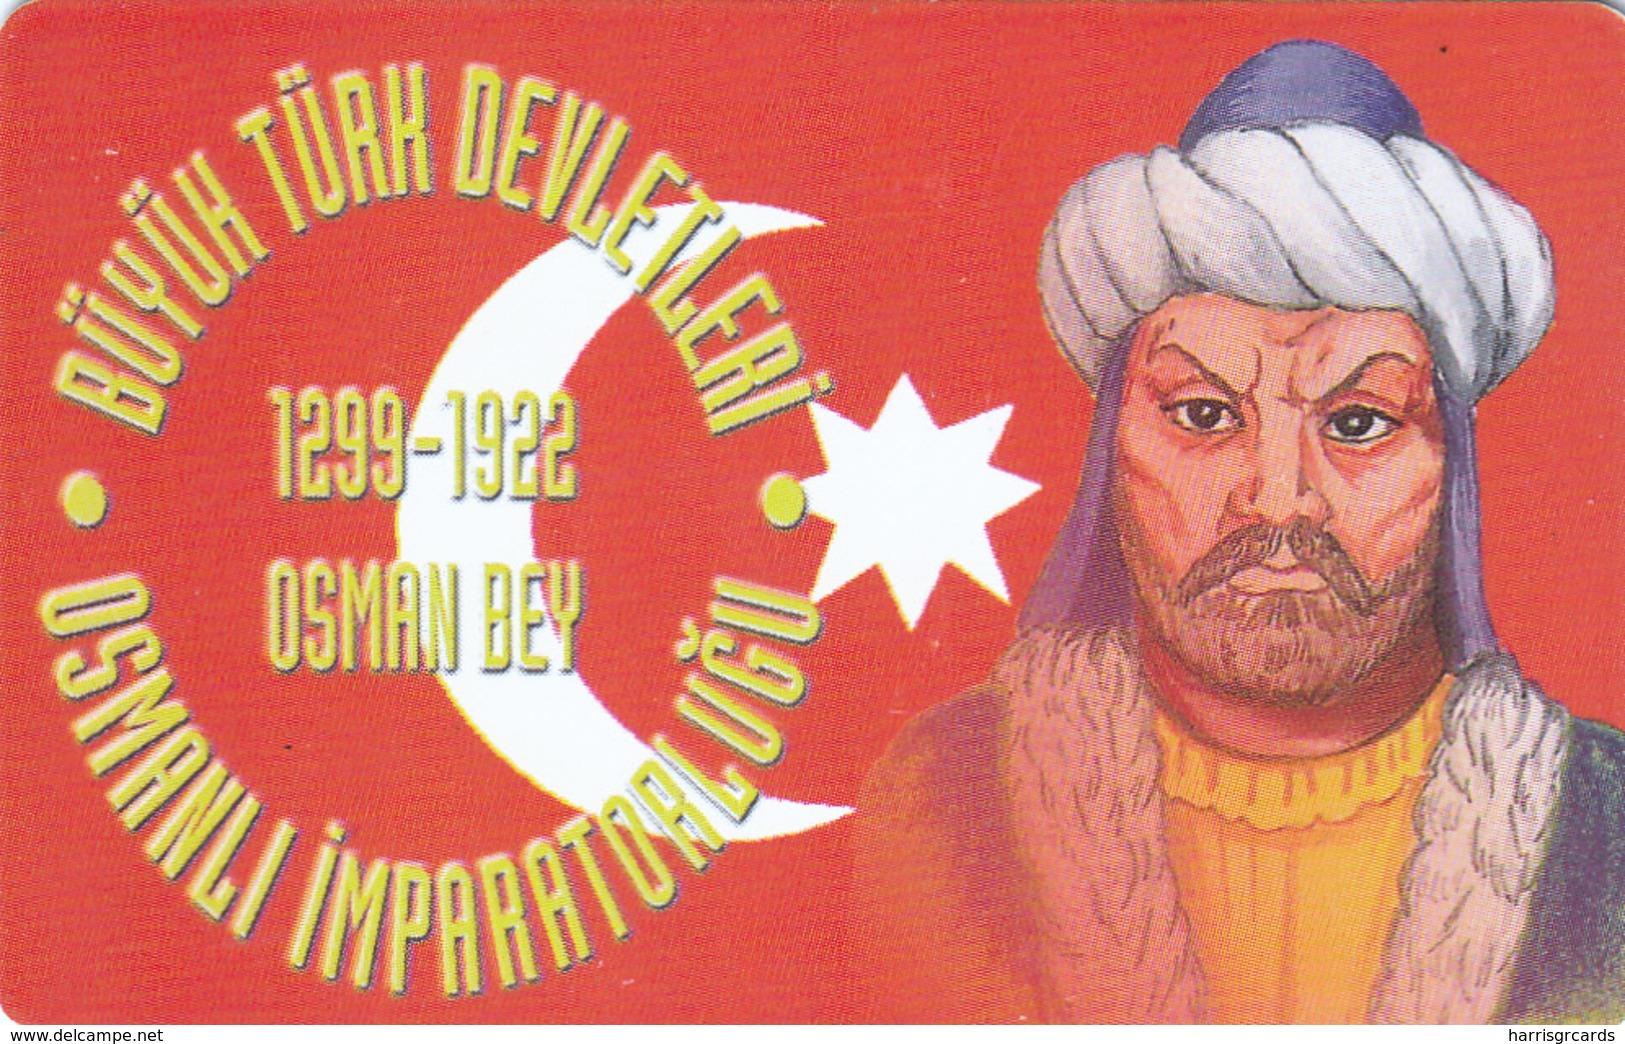 TURKEY - Osmanli Empire 1299-1922 Ad Founder Osman Bey ,Chip OR04 (Module 37) , 100 Unit ,used - Turchia